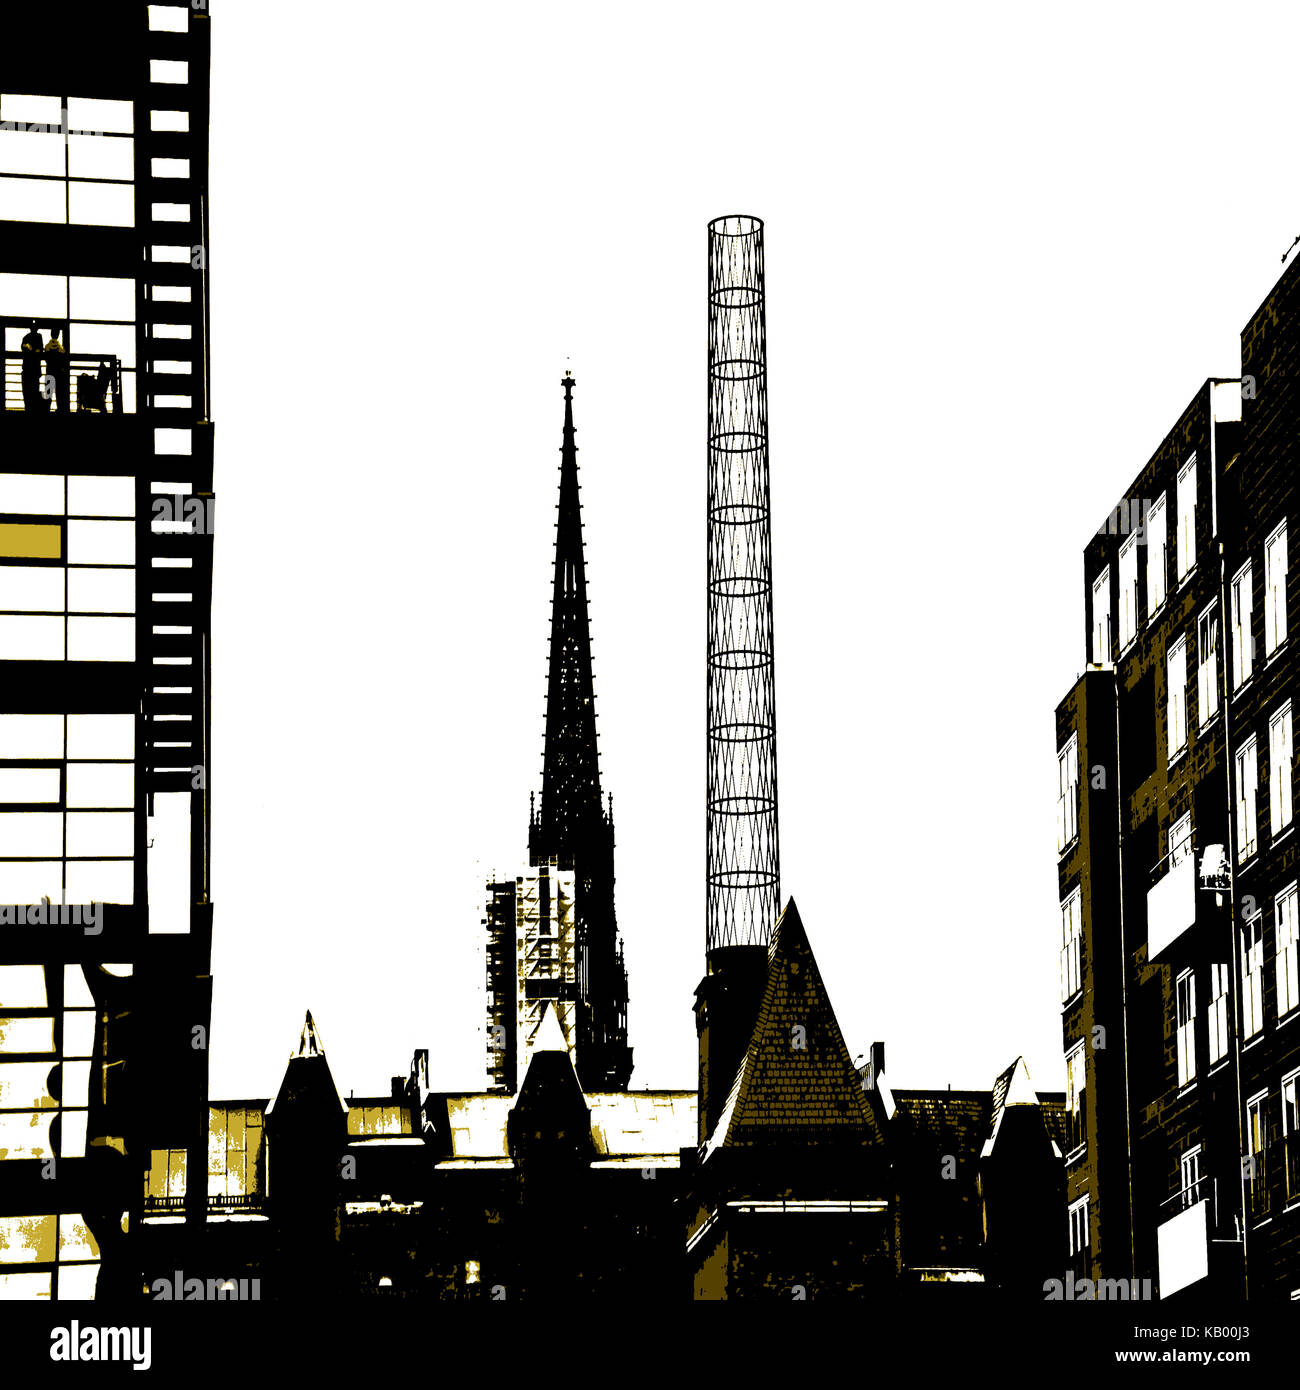 Chimney of the boiler house of the Hafencity Hamburg - Stock Image